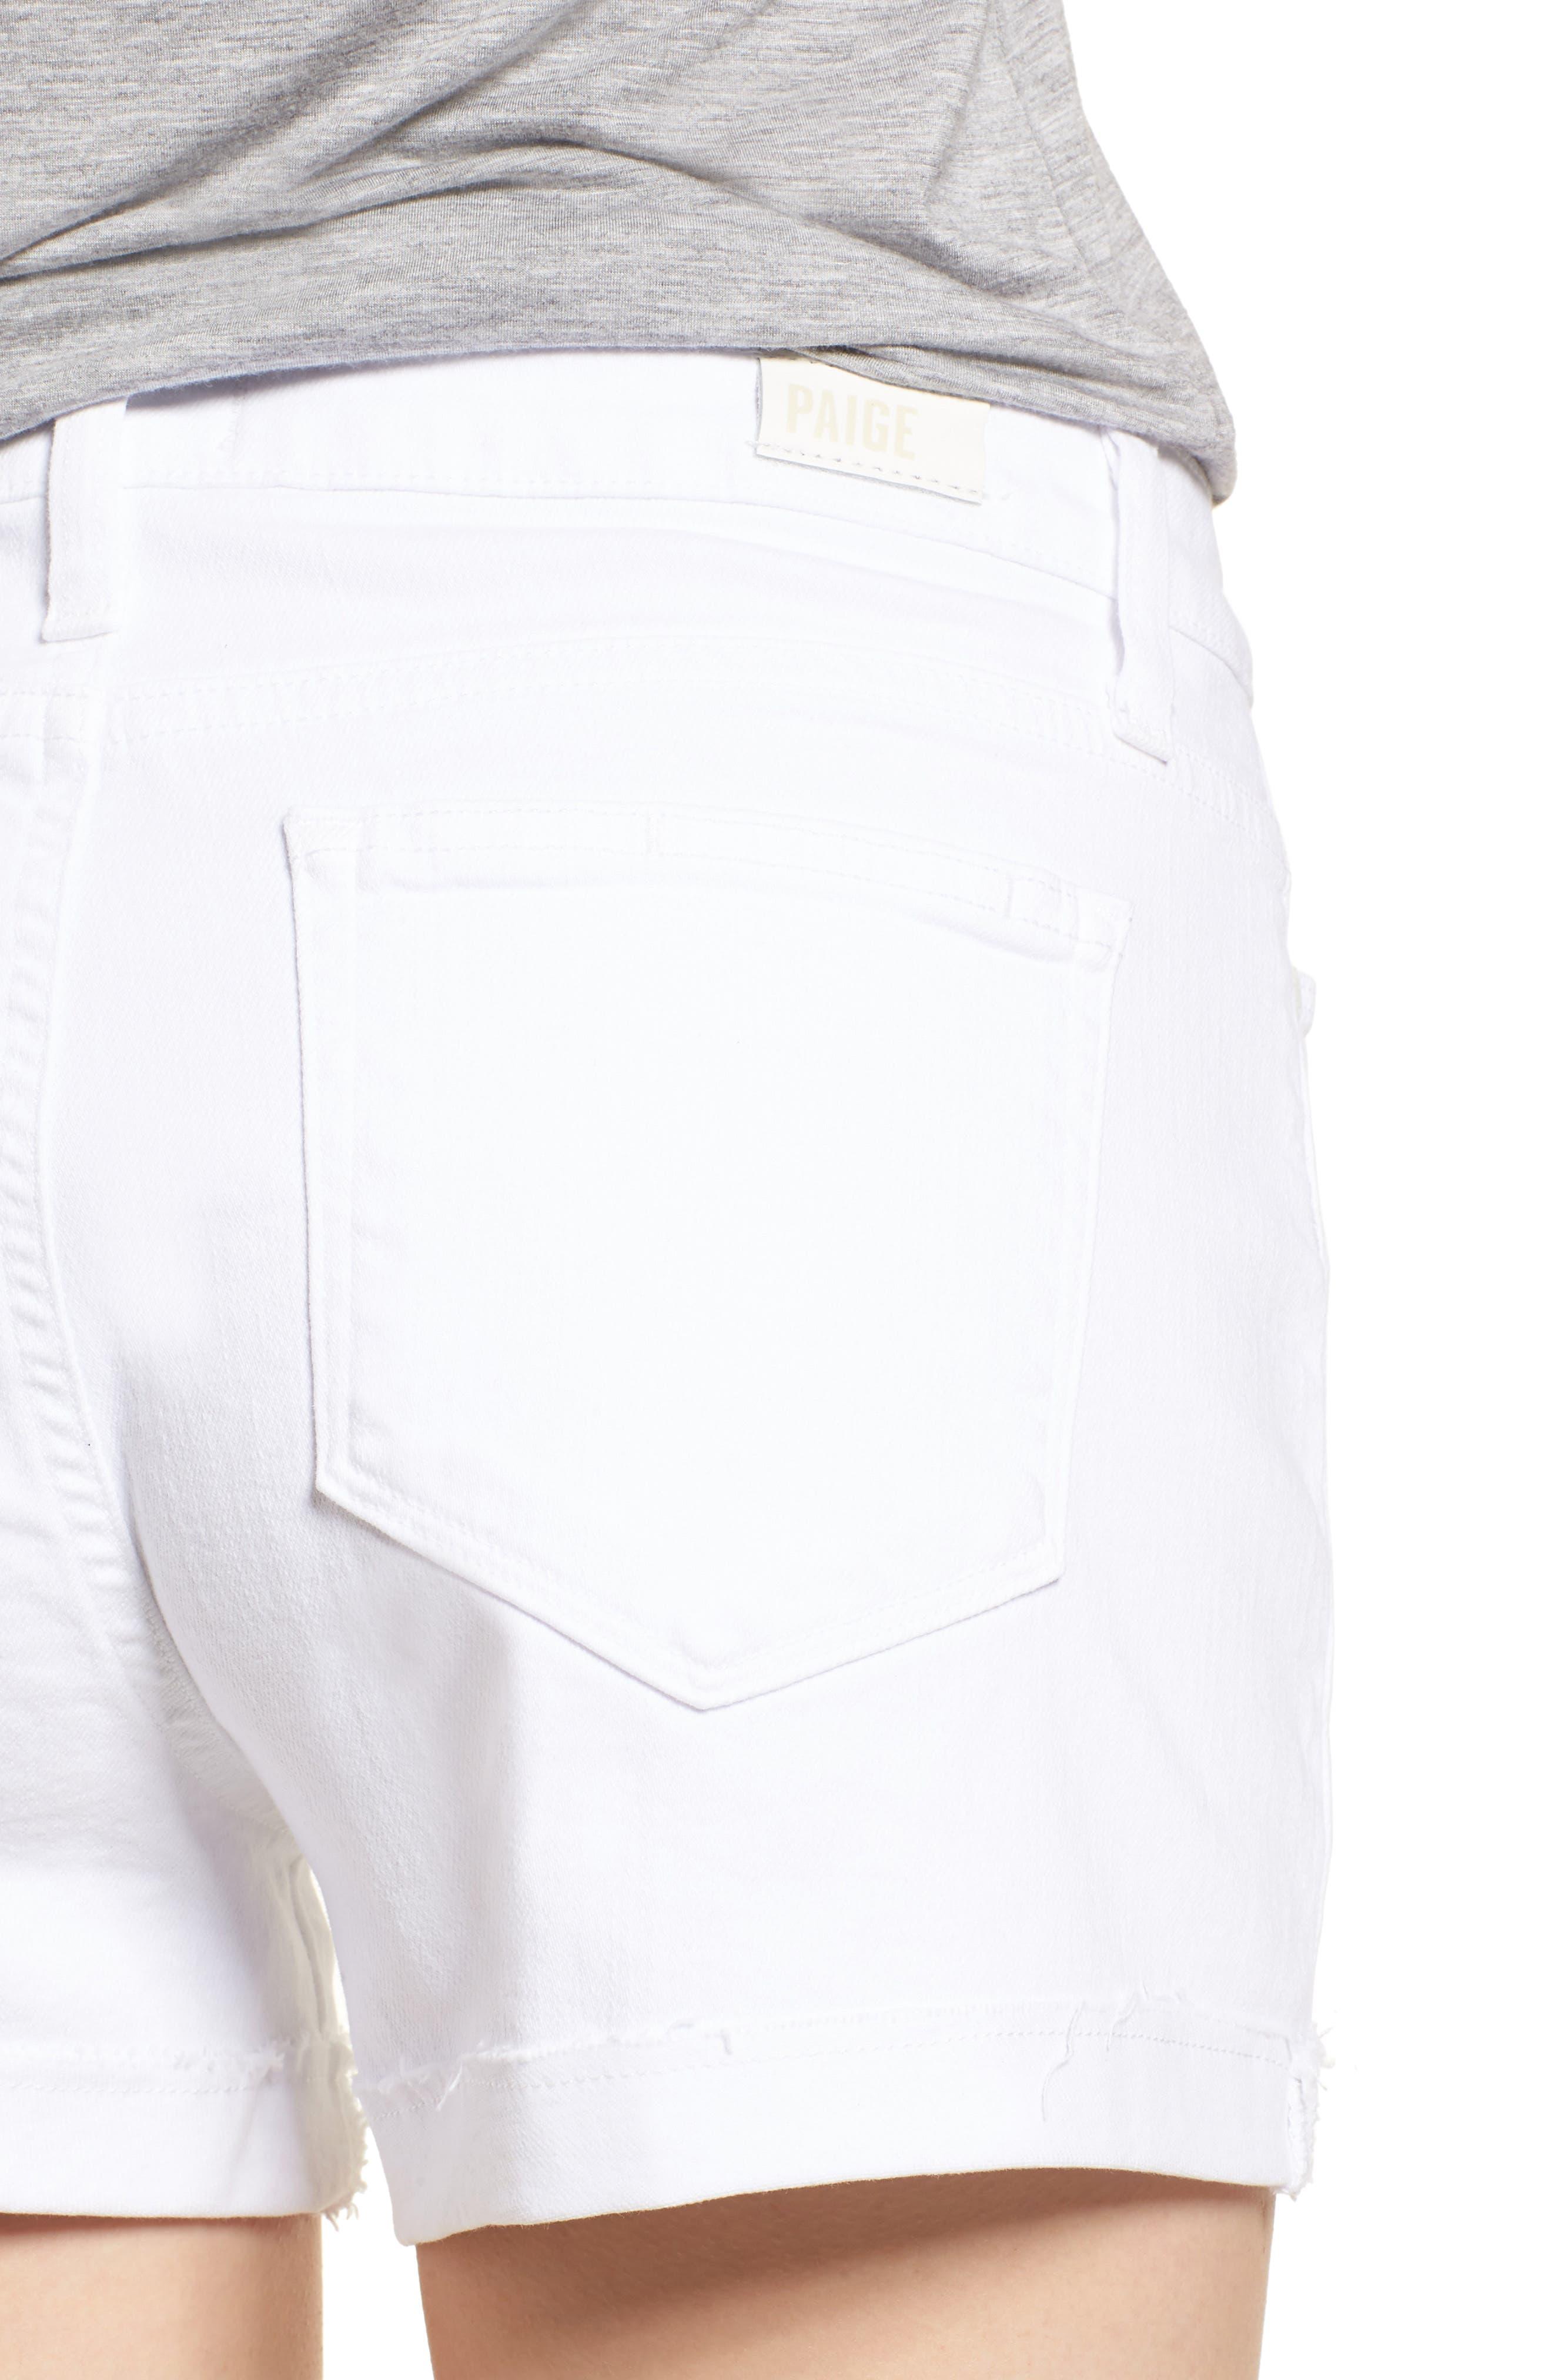 Jimmy Jimmy High Waist Denim Shorts,                             Alternate thumbnail 4, color,                             Crisp White